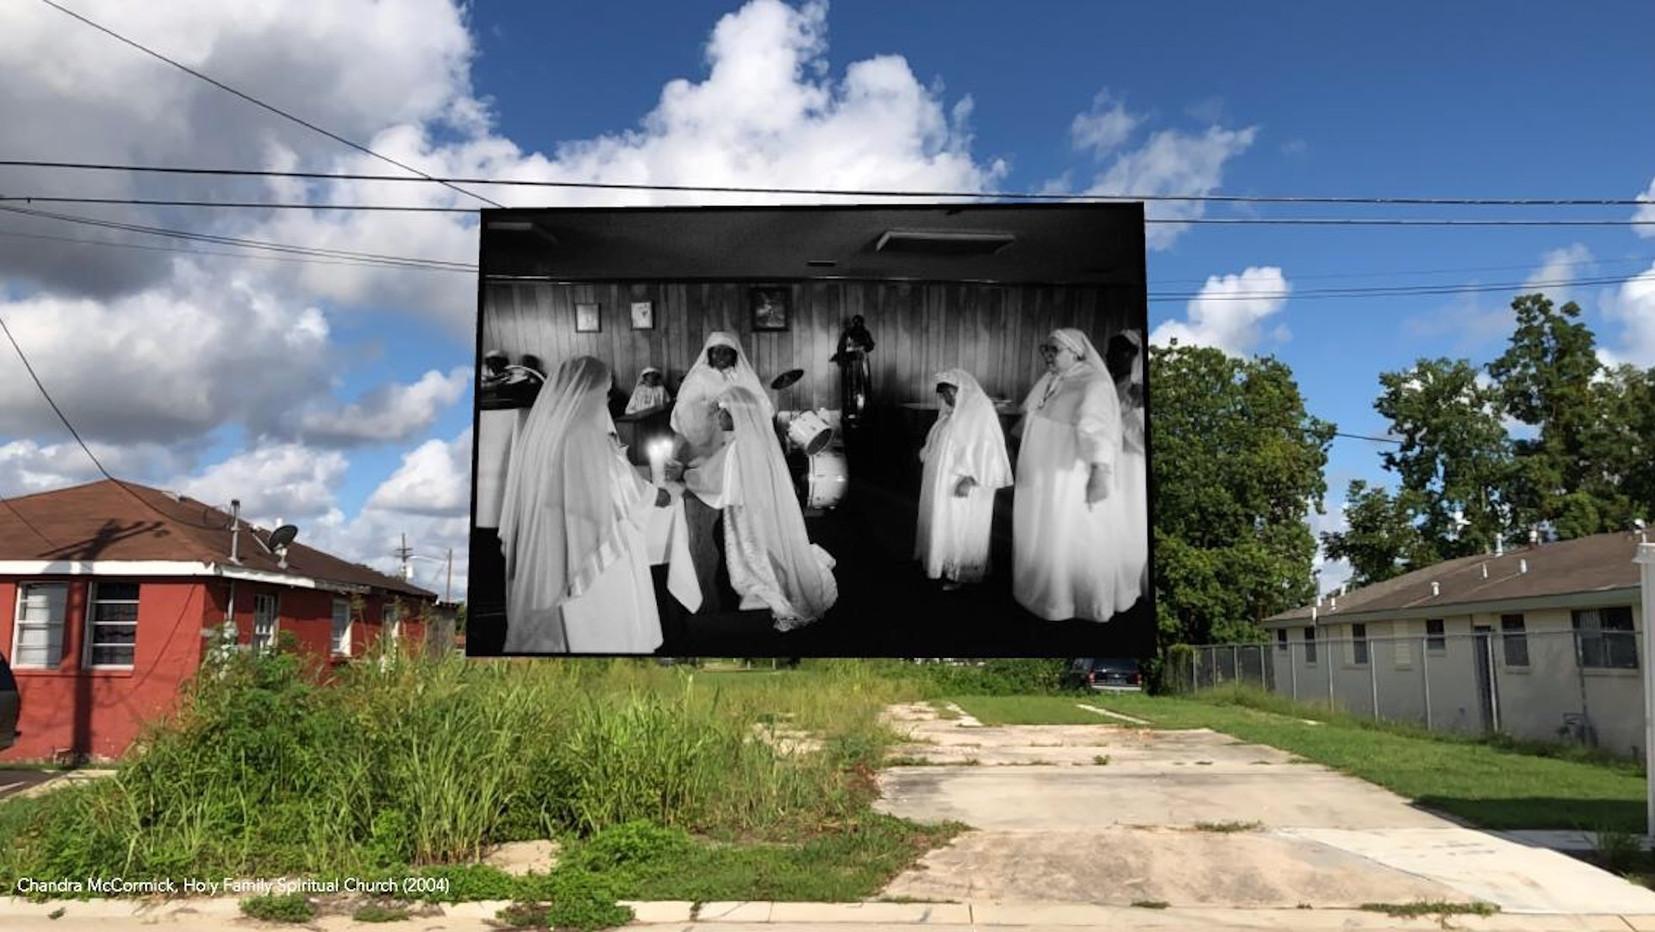 Chandra McCormick, Holy Family Spiritual Church